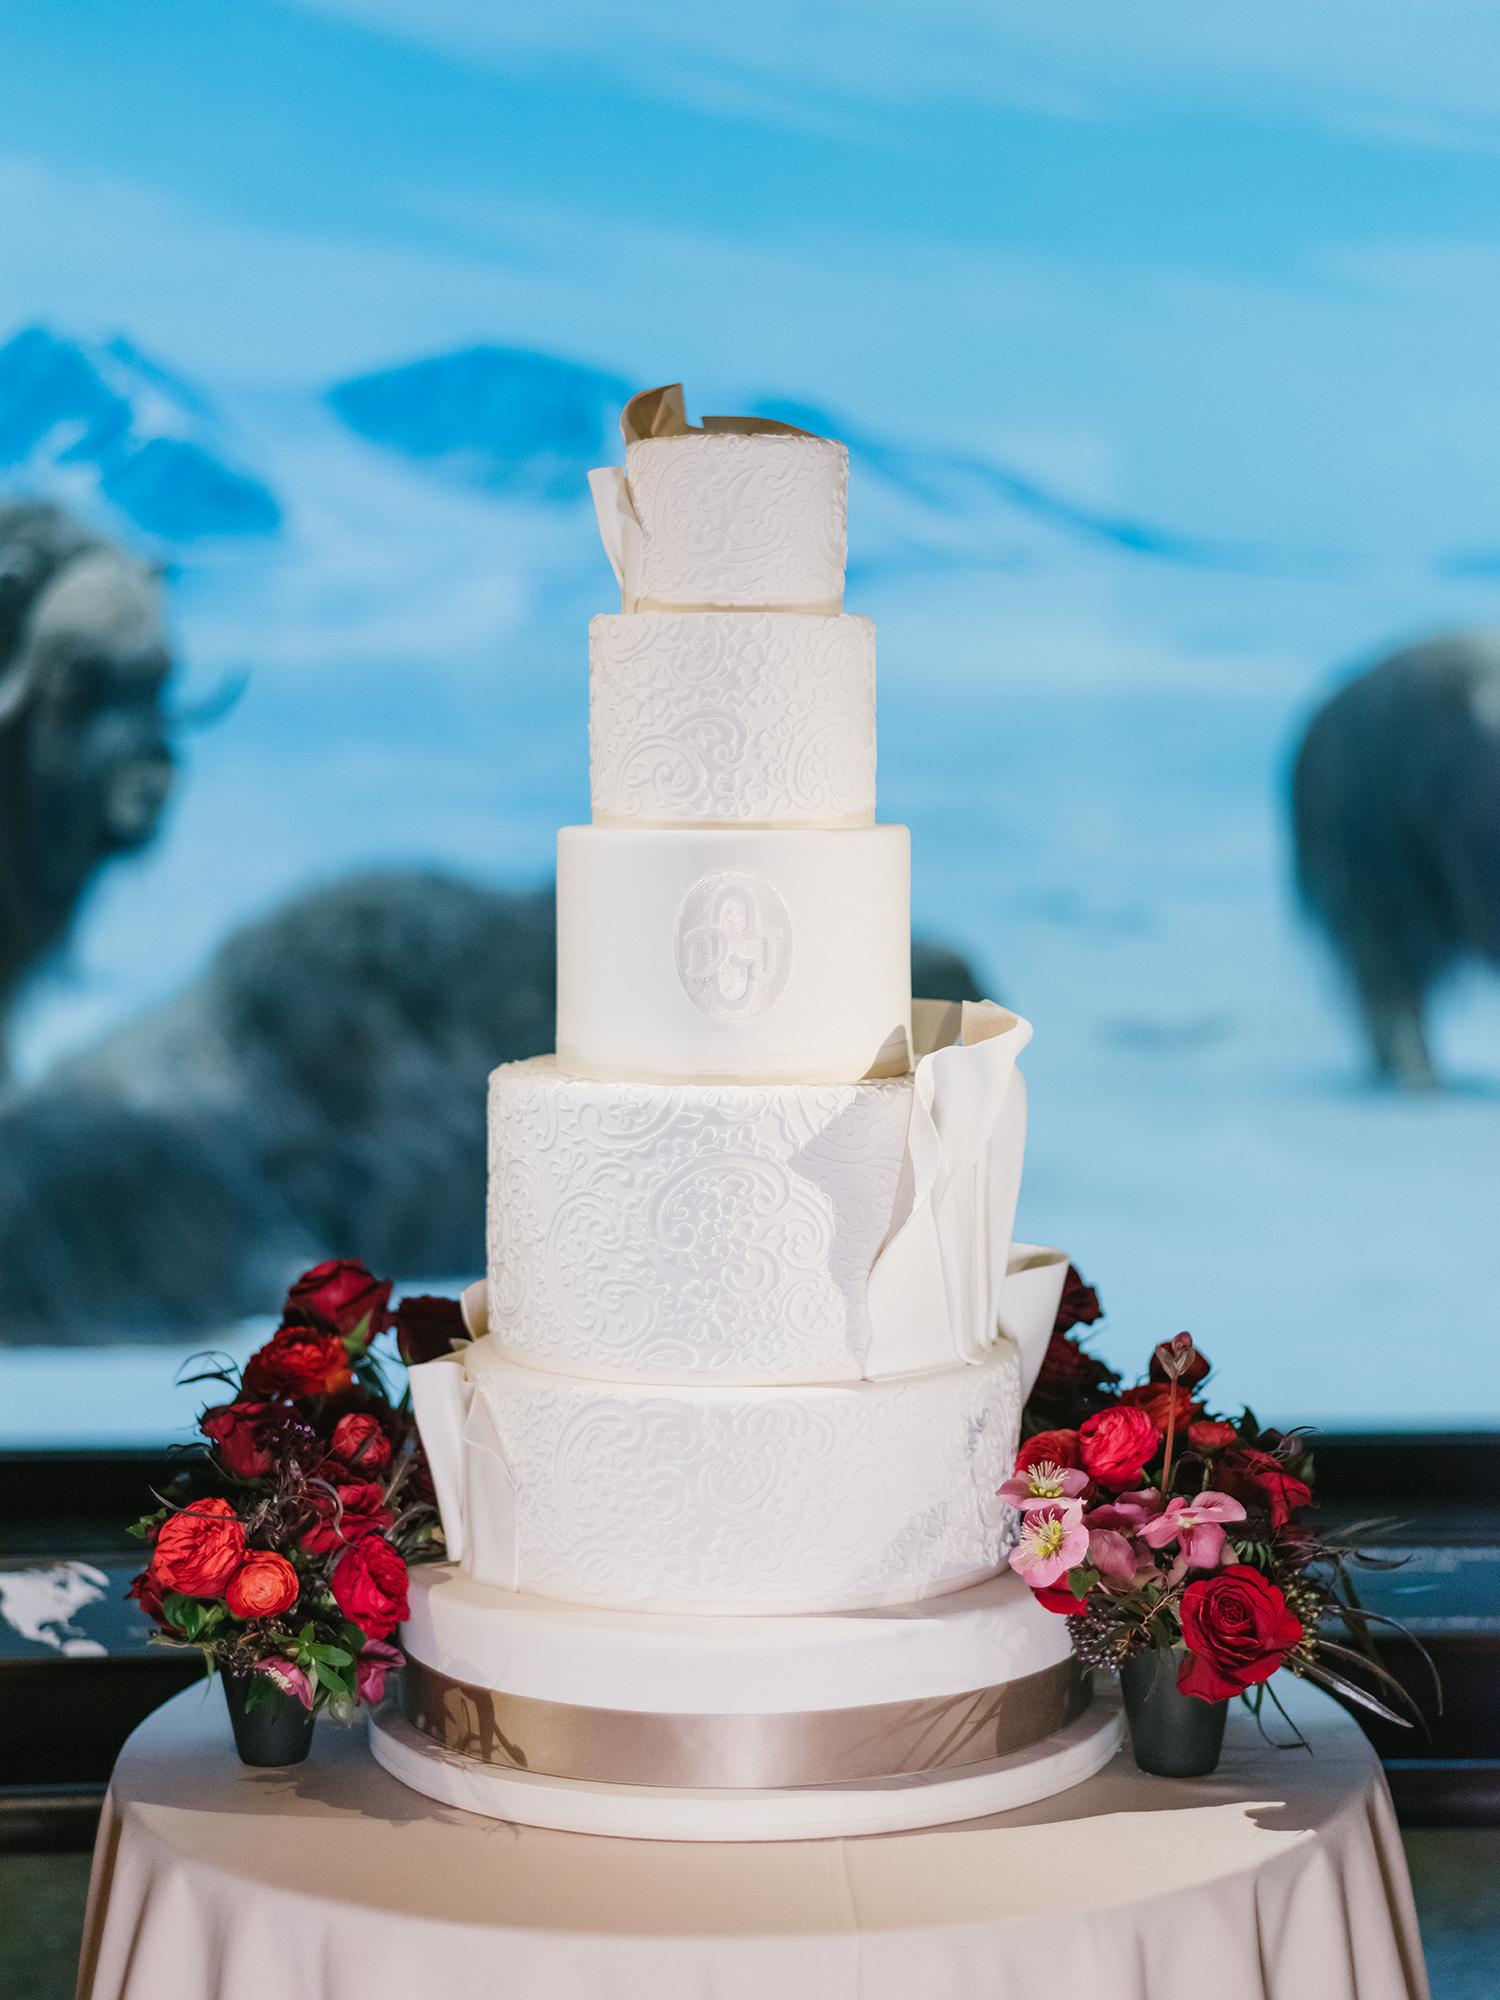 duff goldman classic white wedding cake